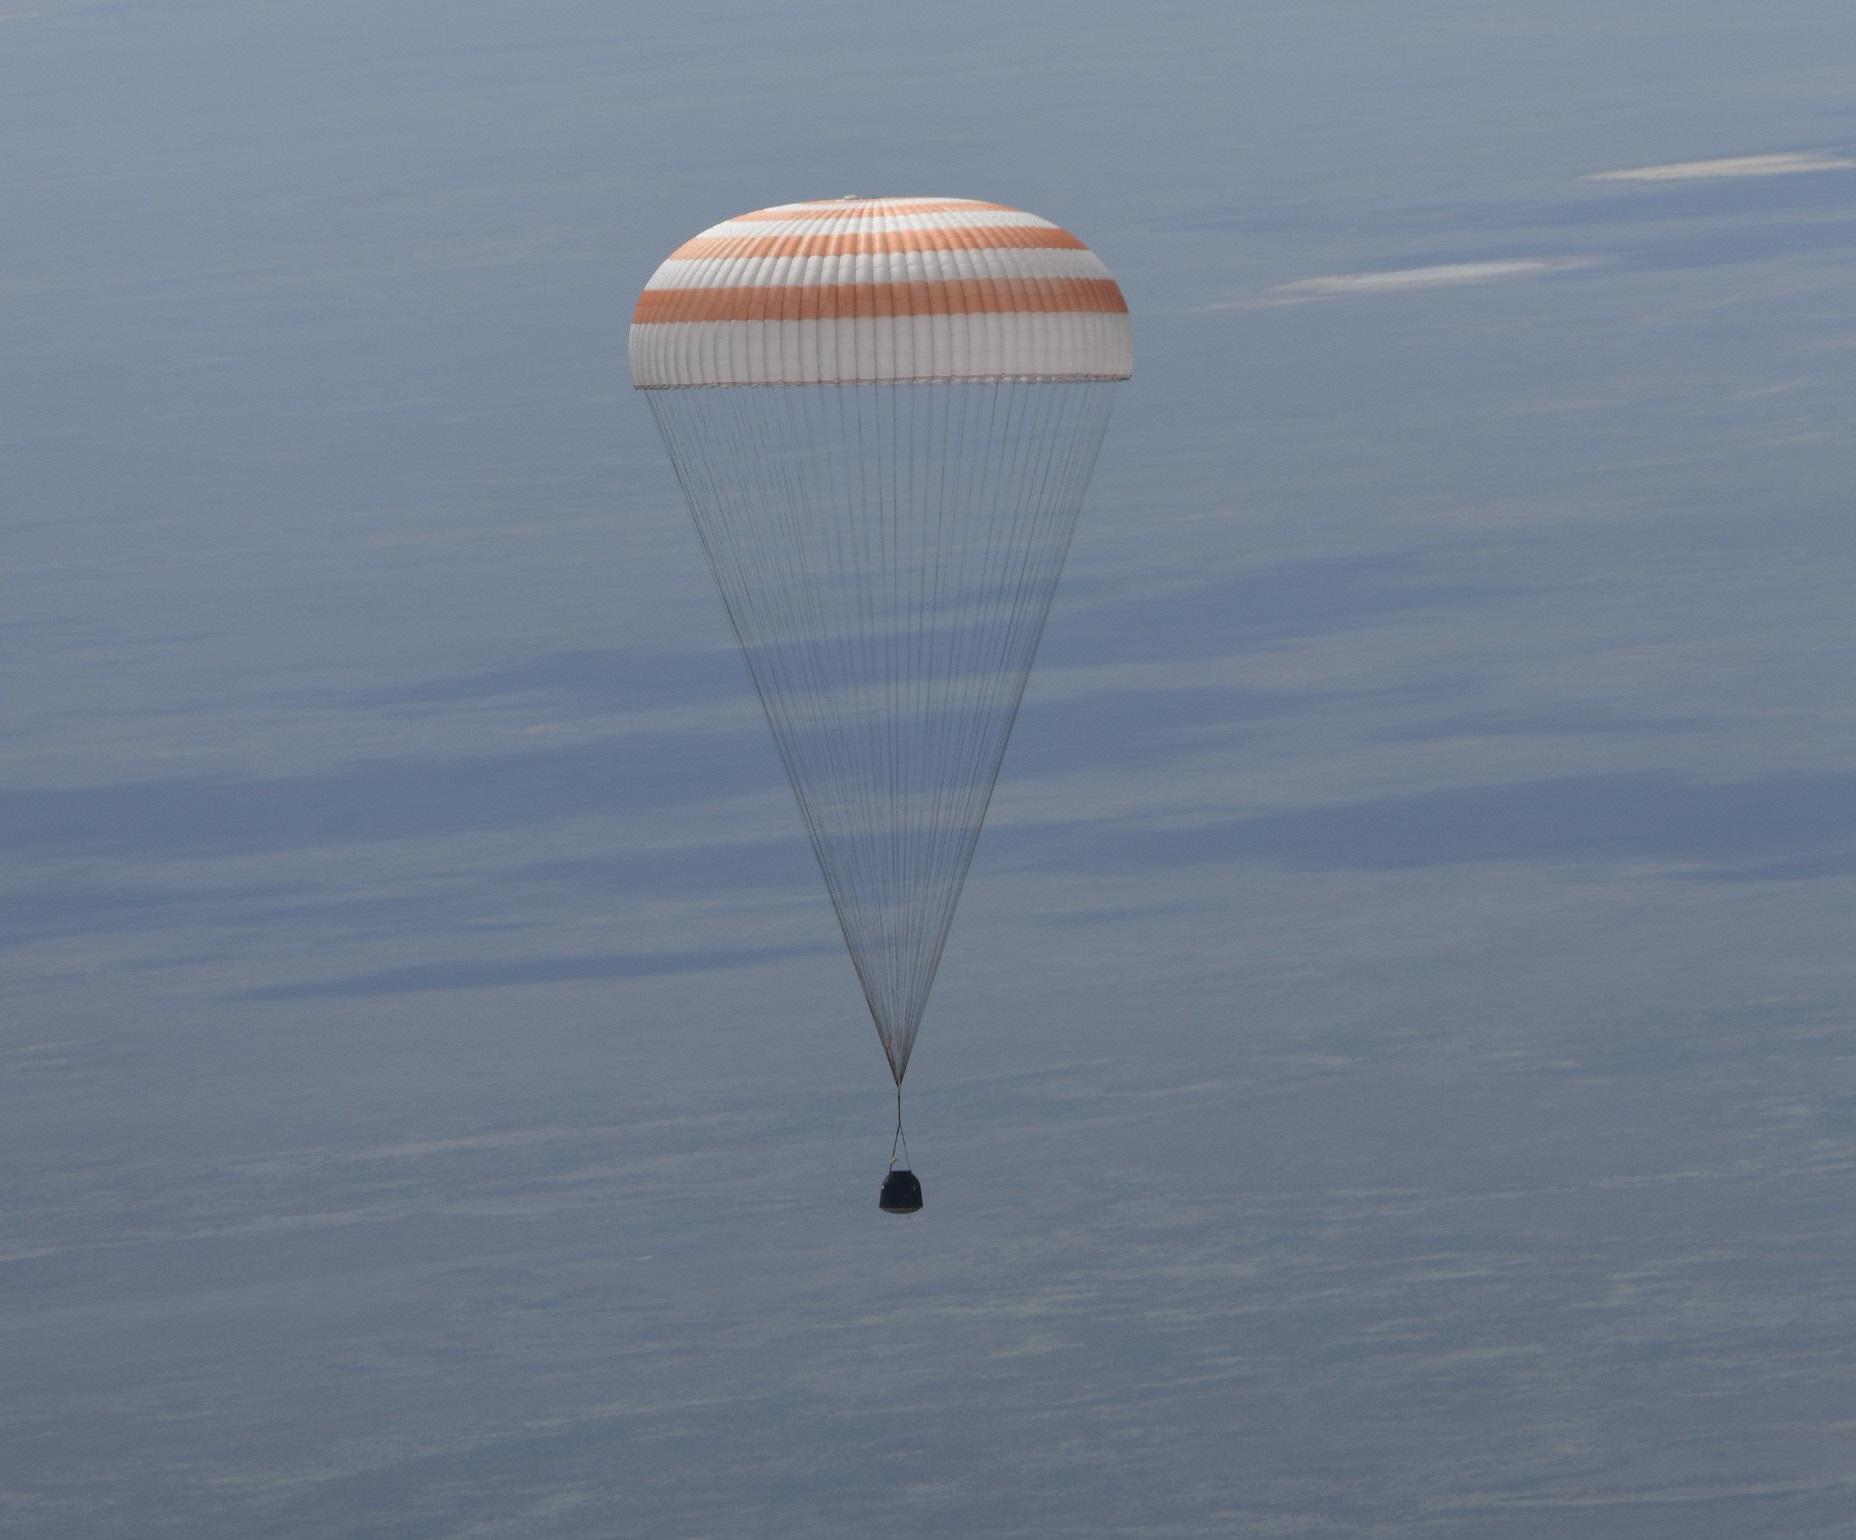 Landing_of_the_Soyuz_TMA-19M_spacecraft2